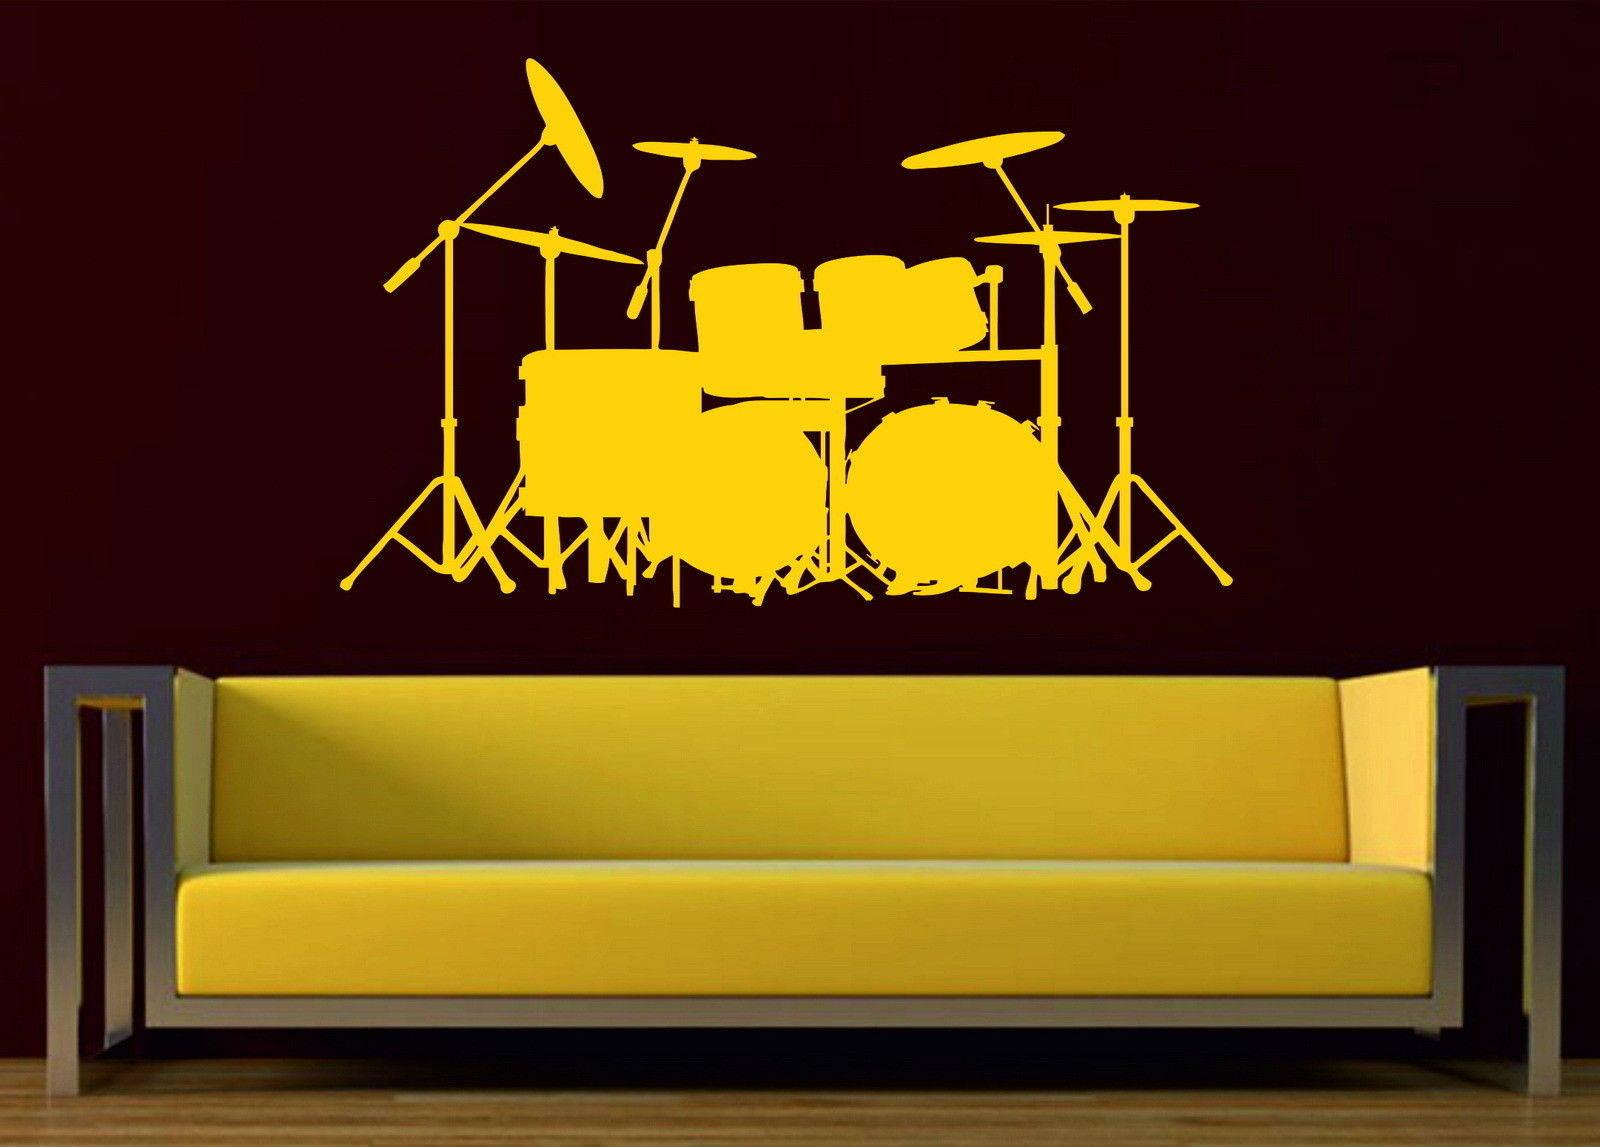 Drum Kit Set Acoustic Music Decor Vinyl Wall Sticker Bedroom ...